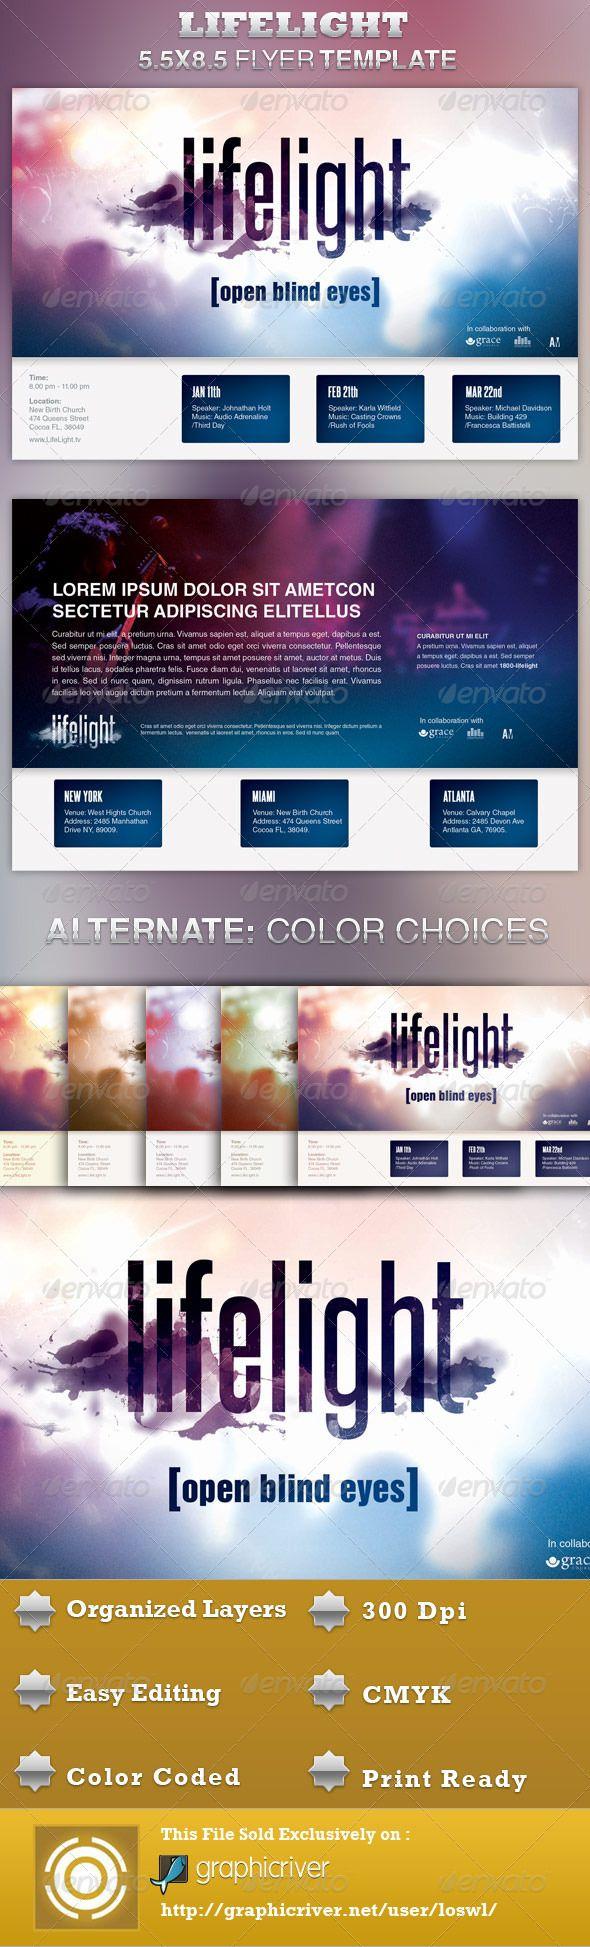 best images about flyers business flyer lifelight church concert flyer template